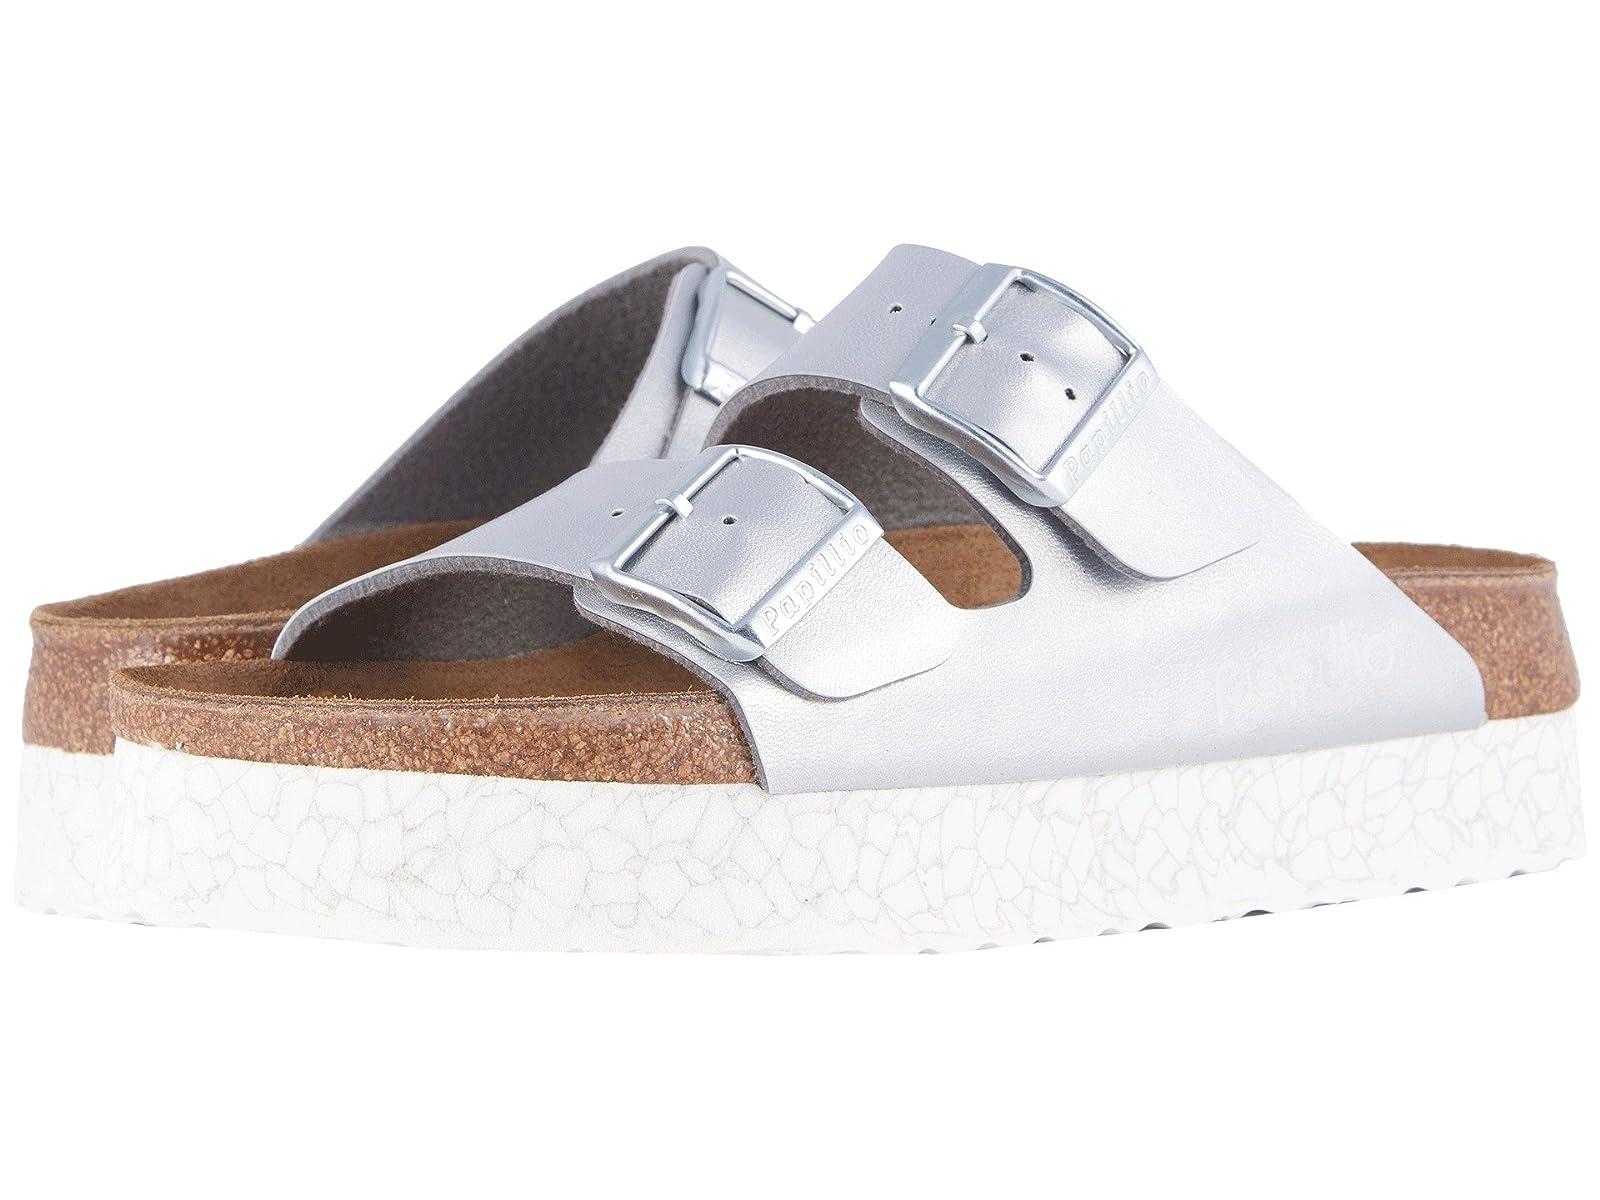 Birkenstock Arizona PlatformComfortable and distinctive shoes